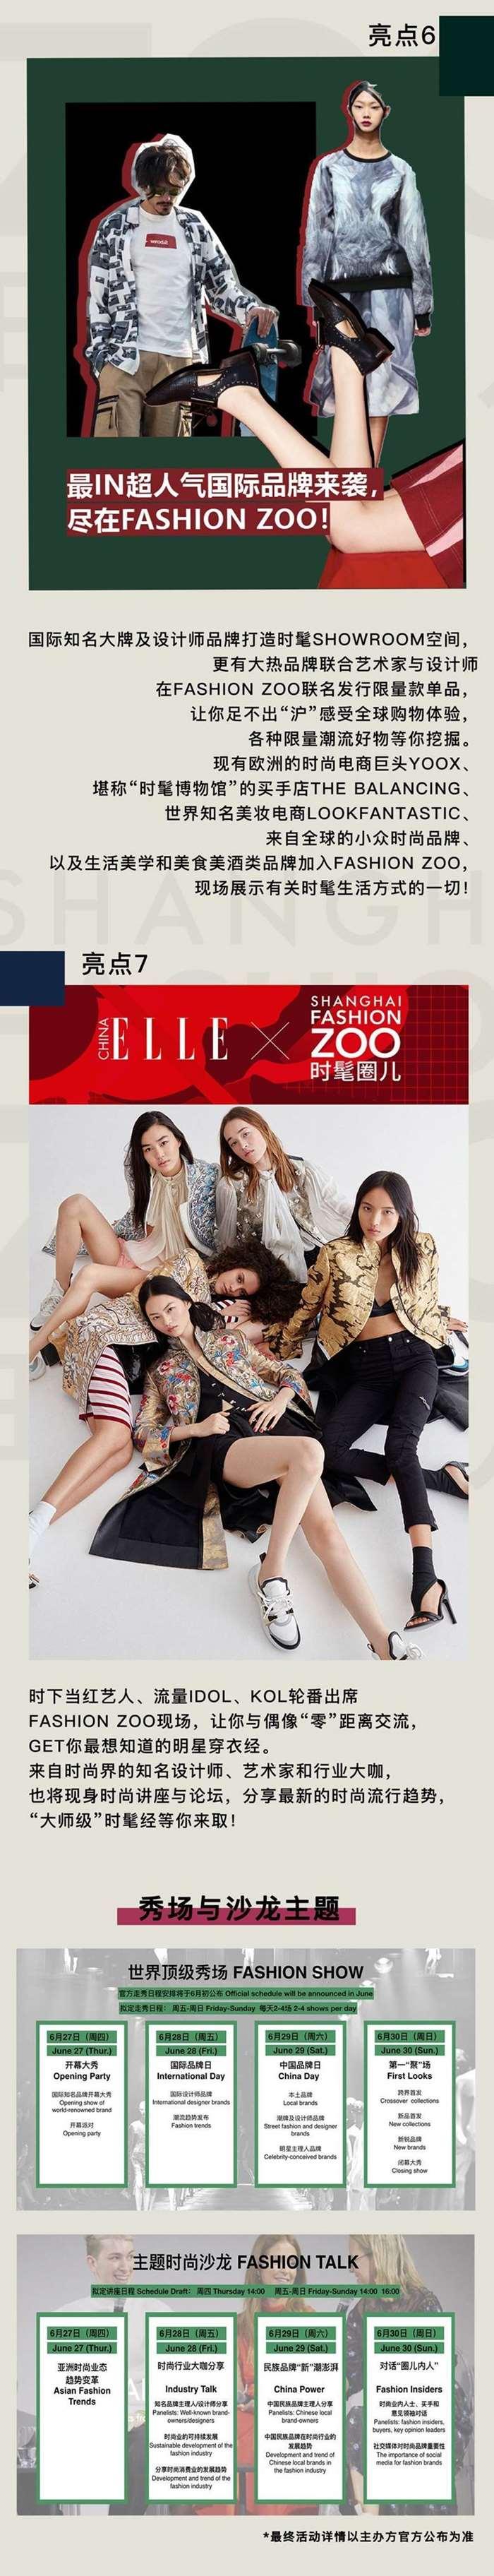 fashionzoo票务活动行 3.jpg